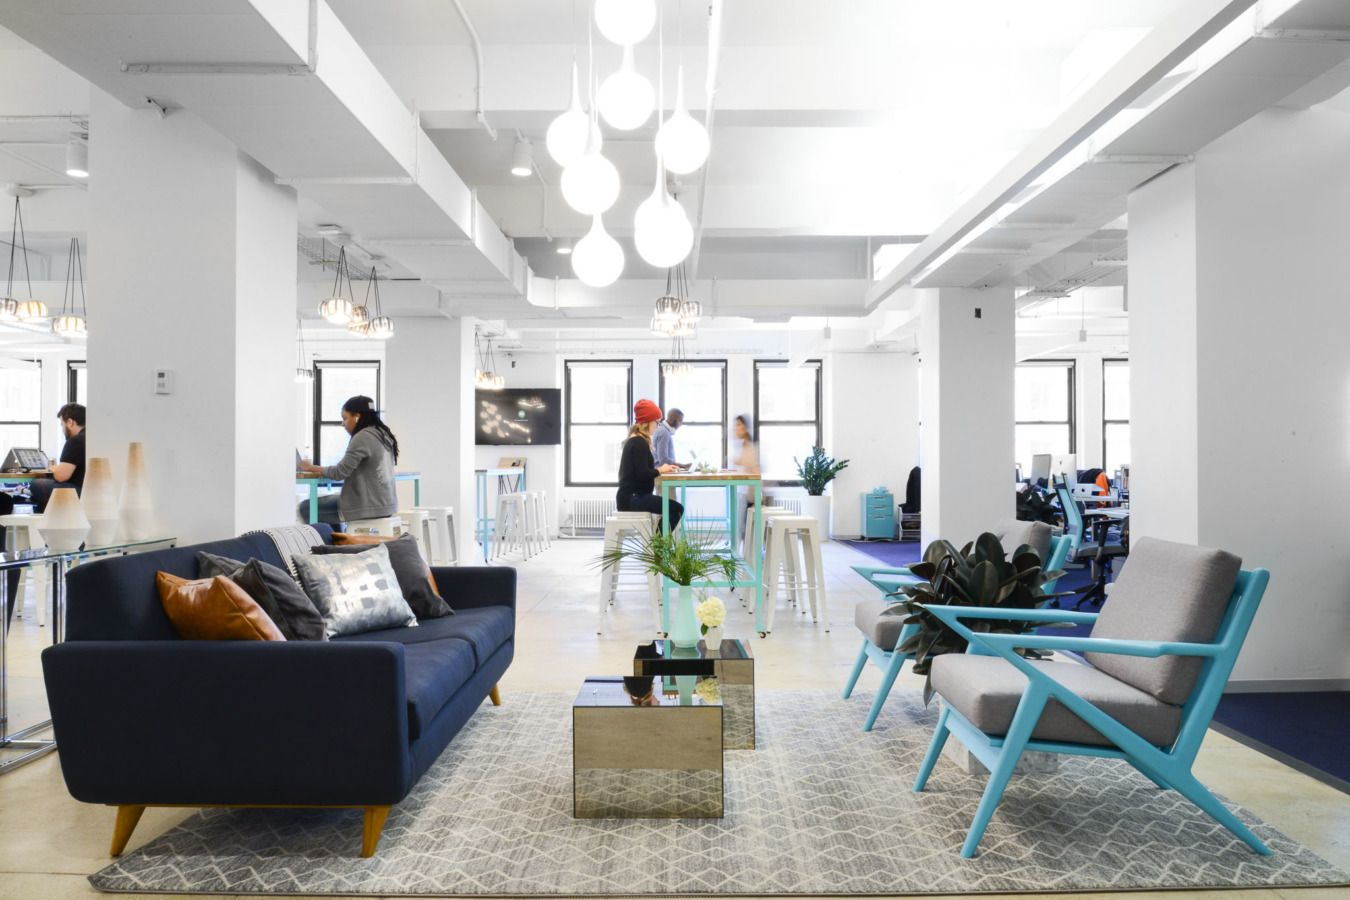 Flexing Design Muscles At Classpass Headquarters Corporate Interiors Lounge Seating Interior Design